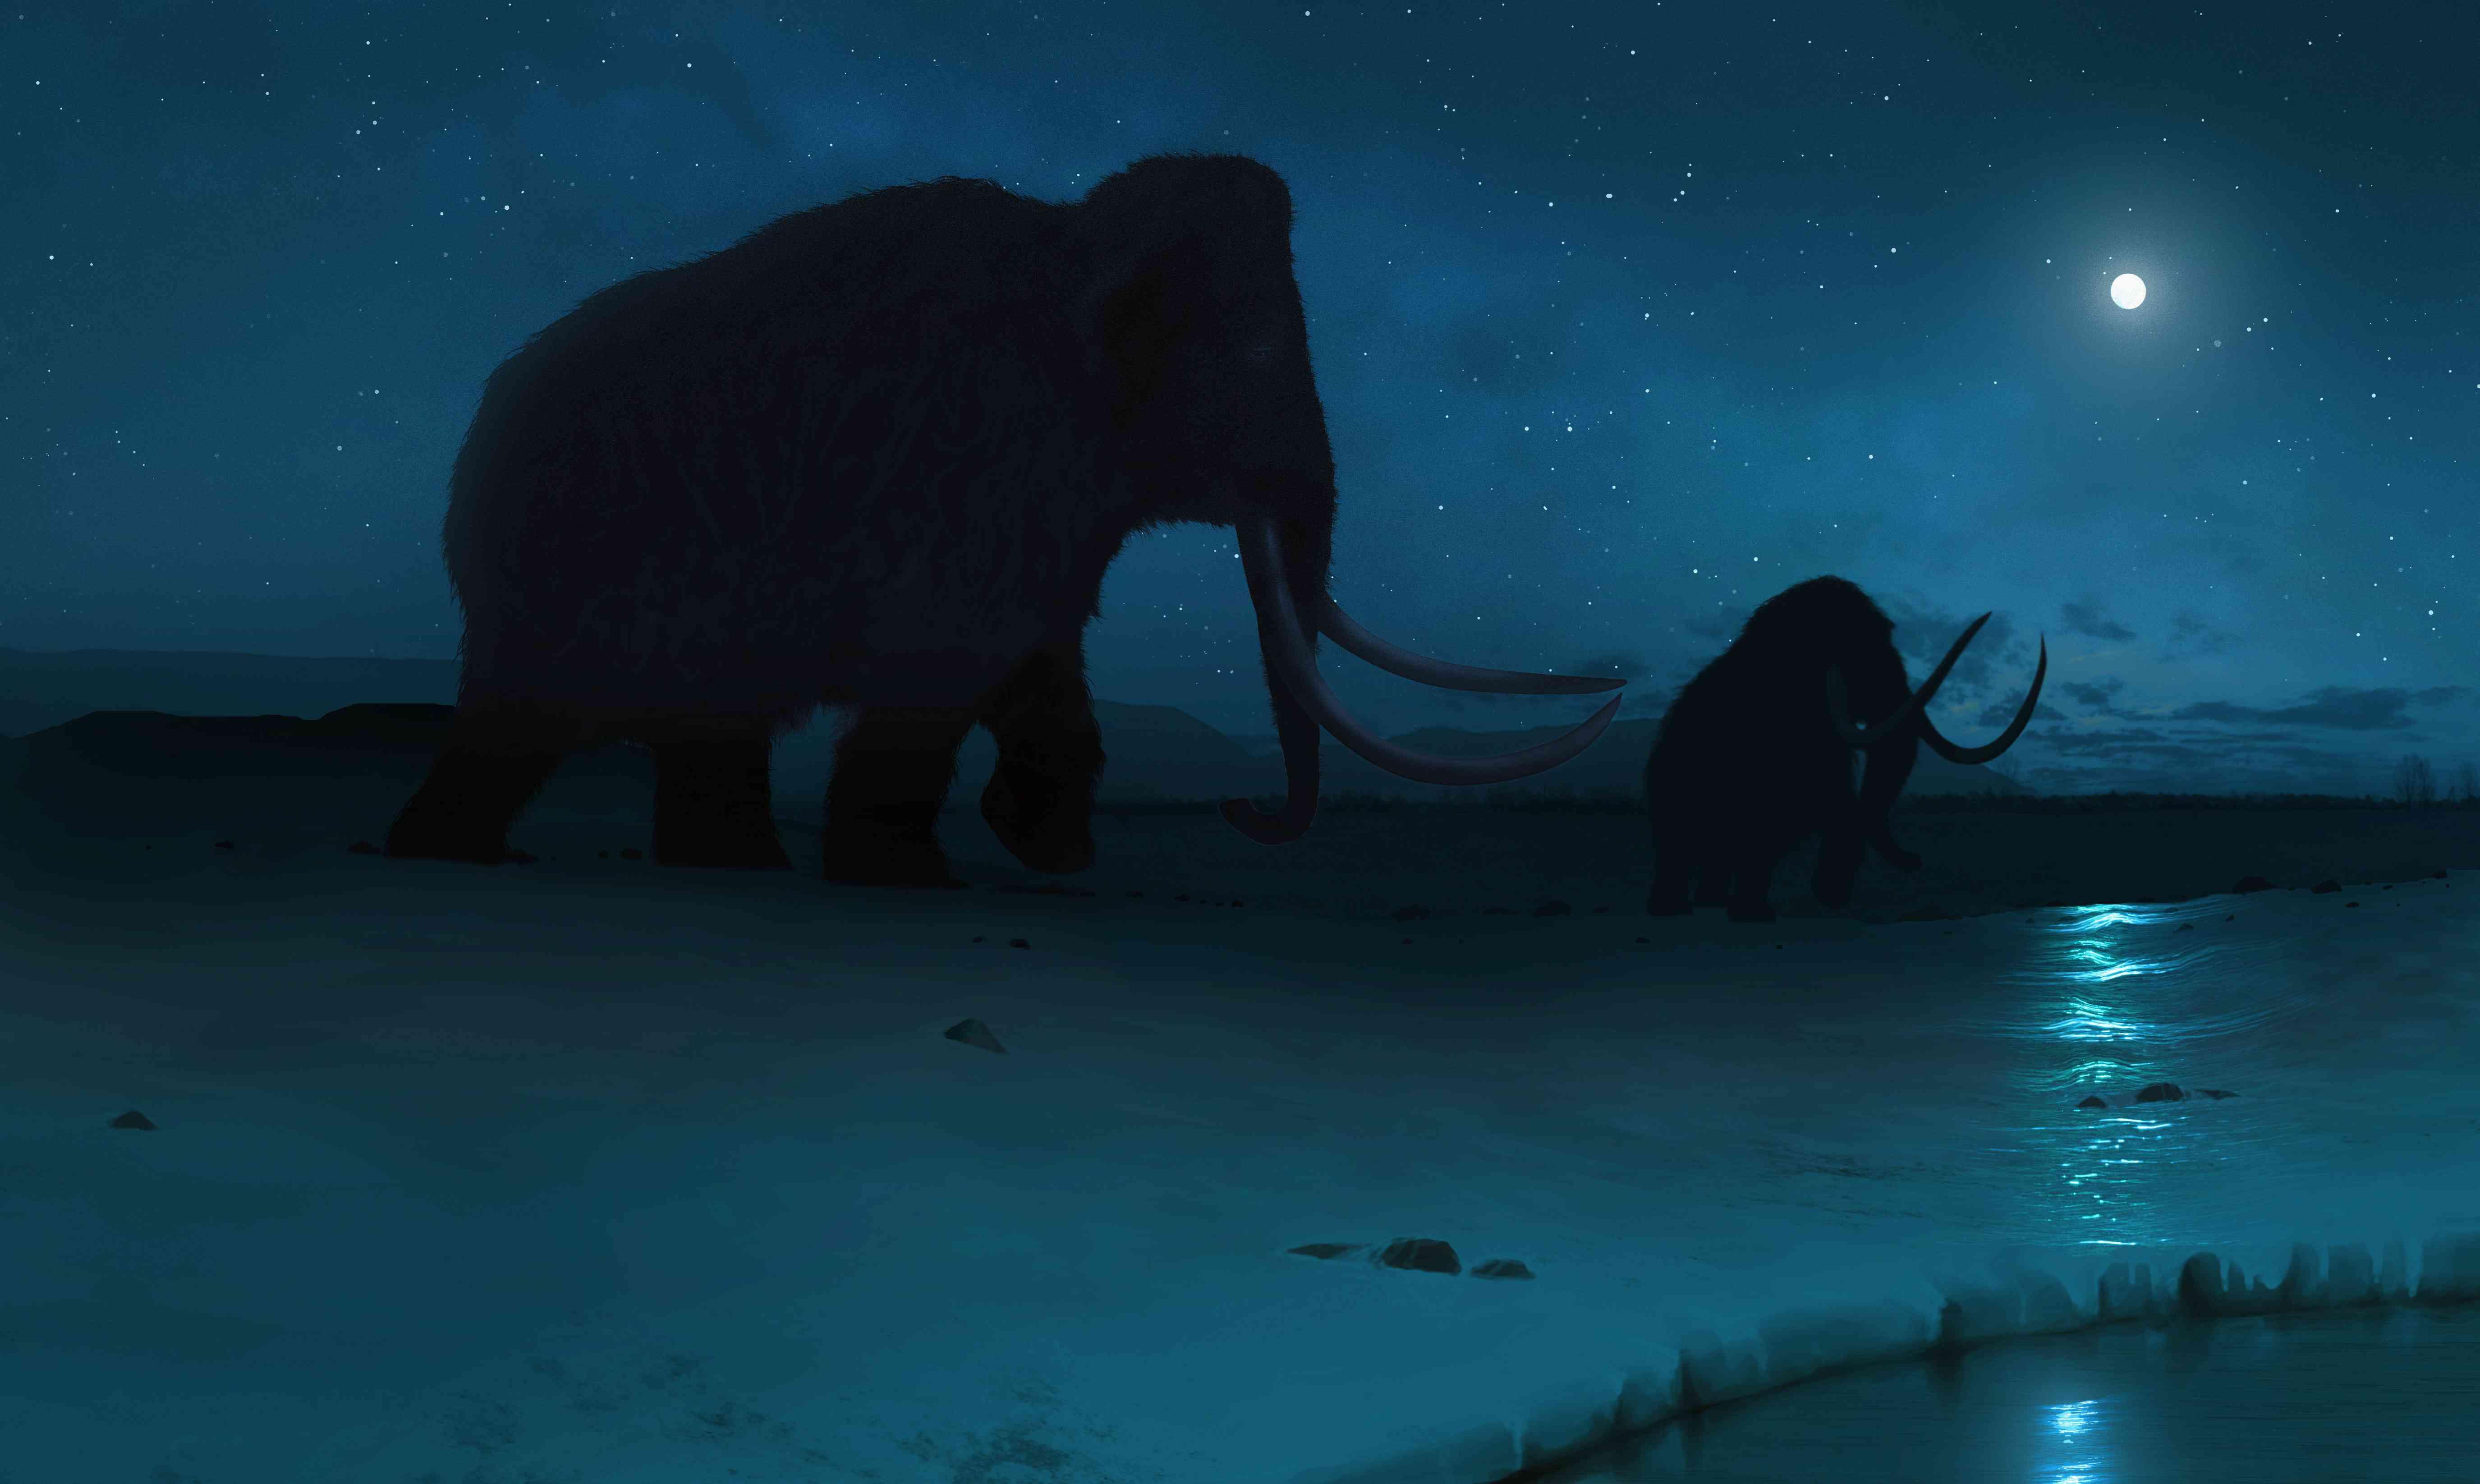 Tundra mammoth, illustration